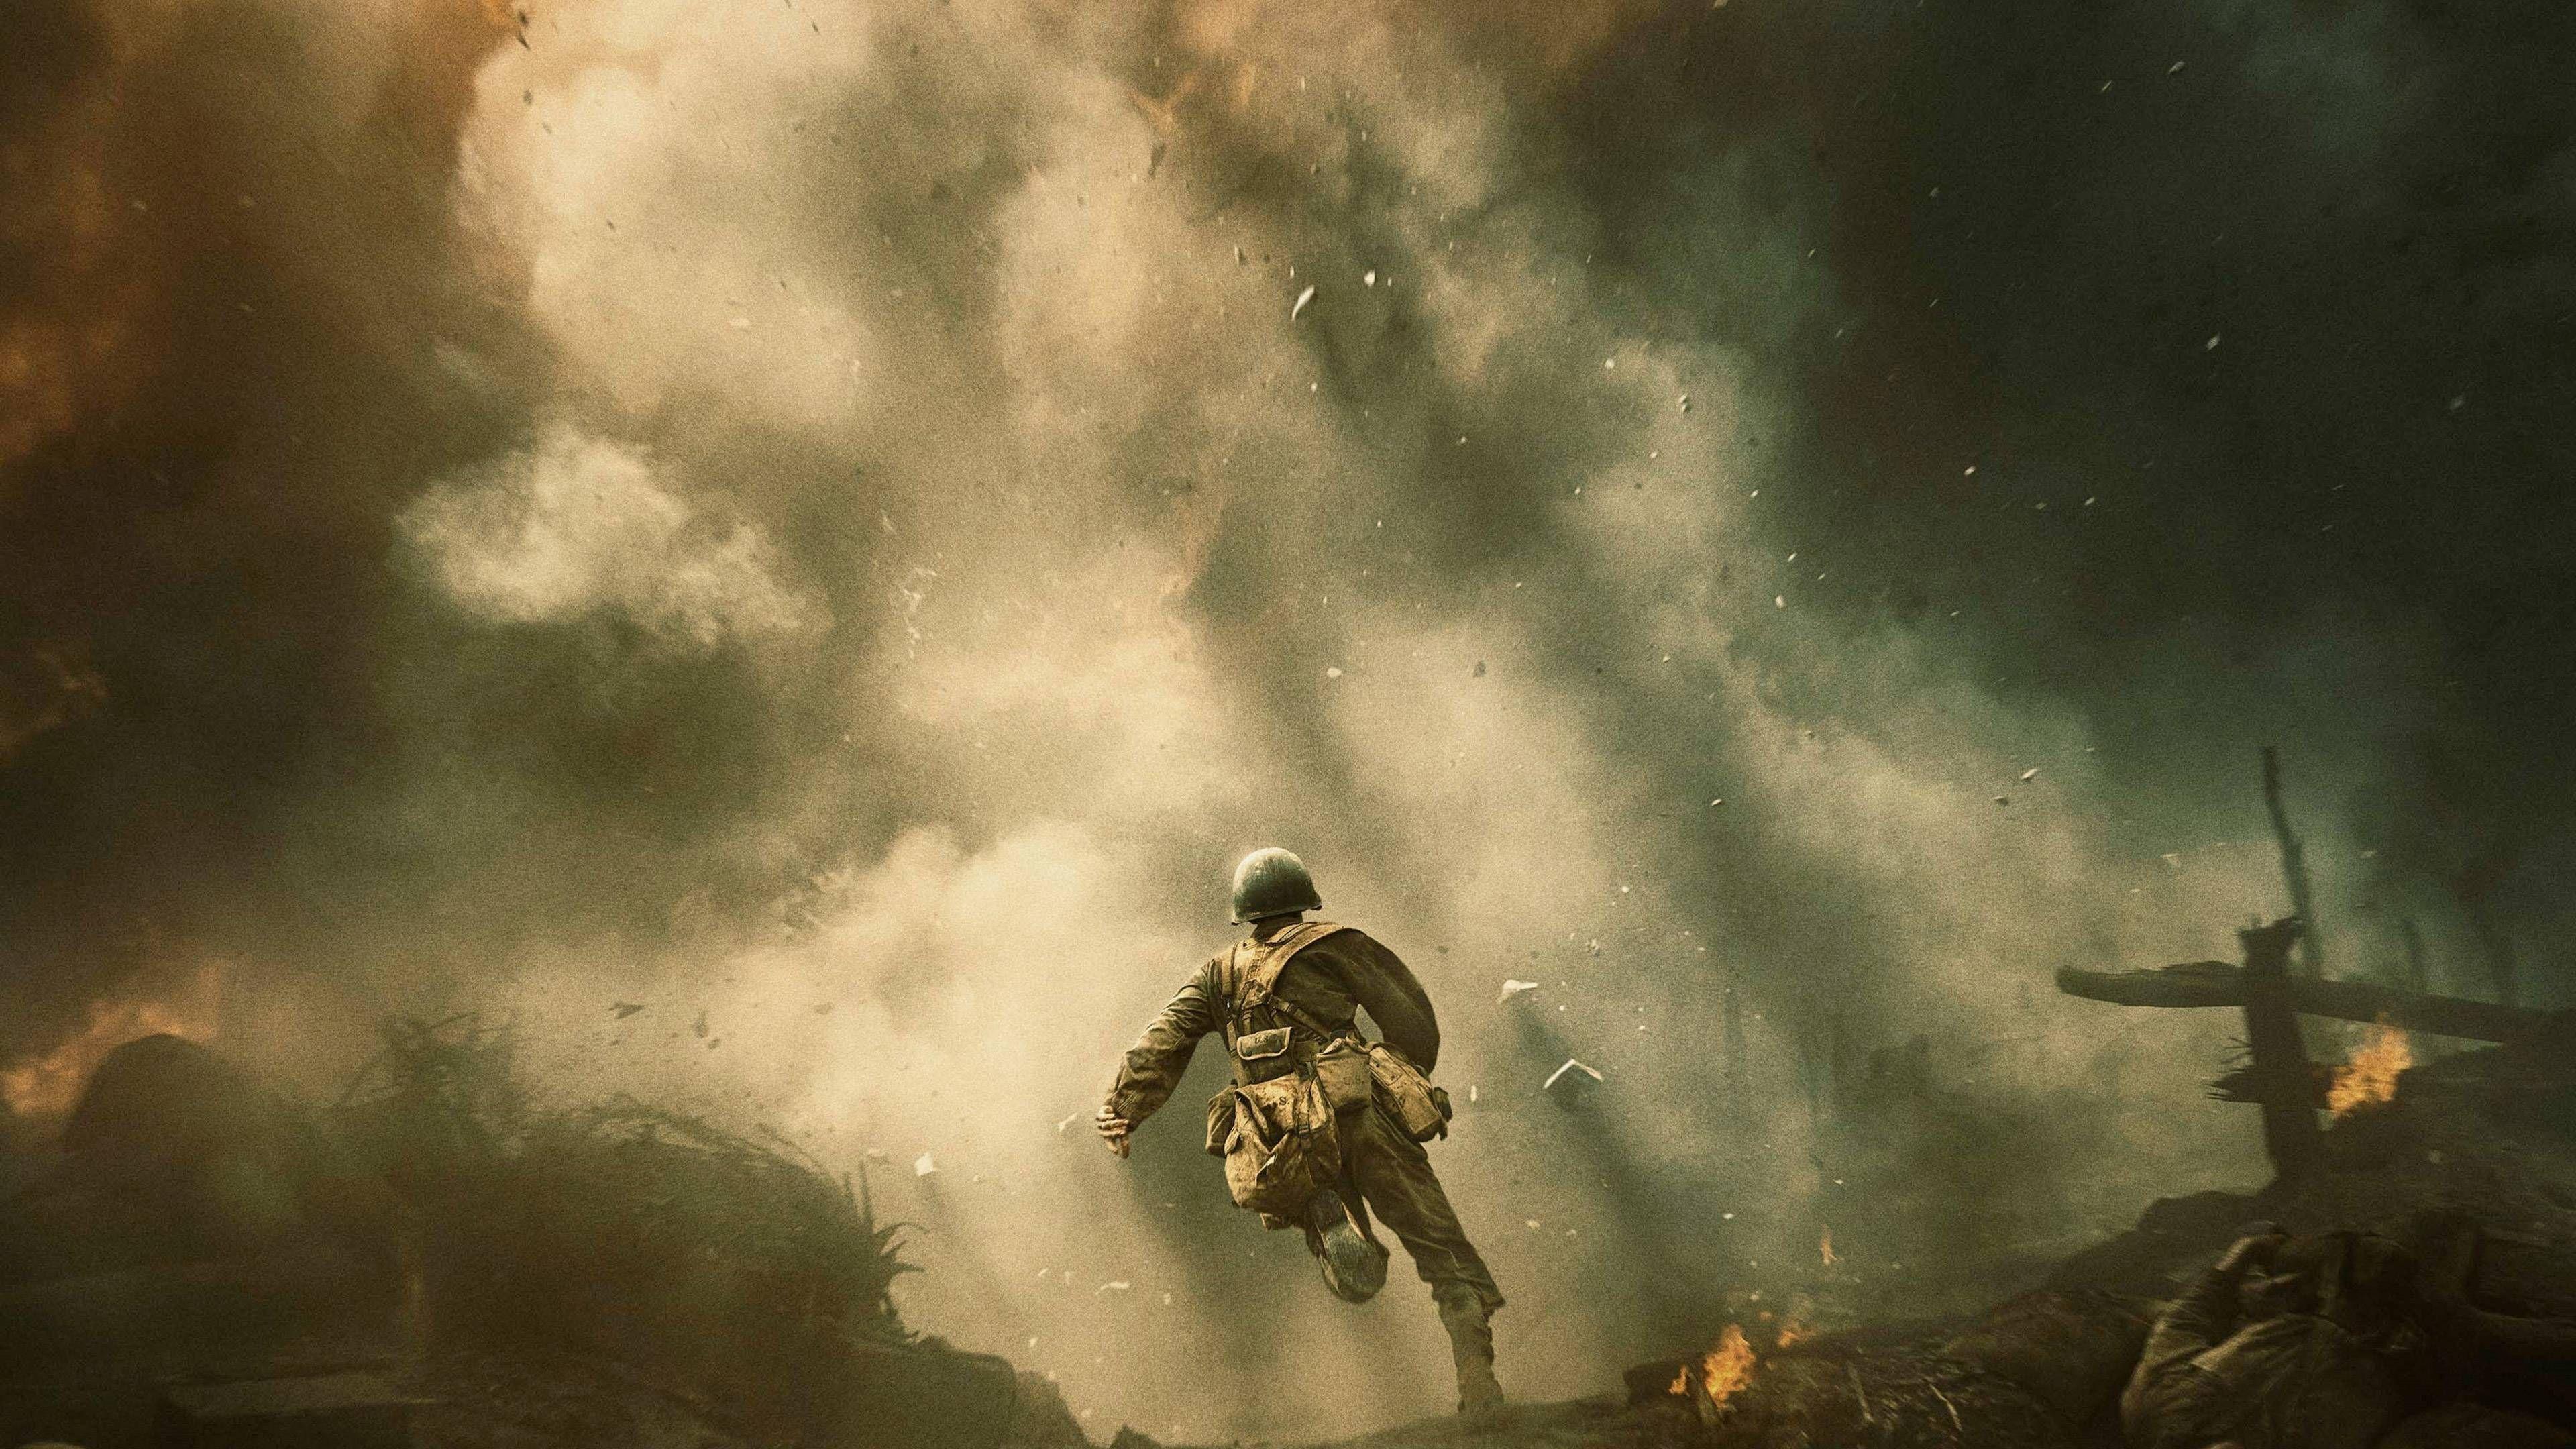 Hacksaw Ridge Itvmovie Download Hd Movies Torrent In